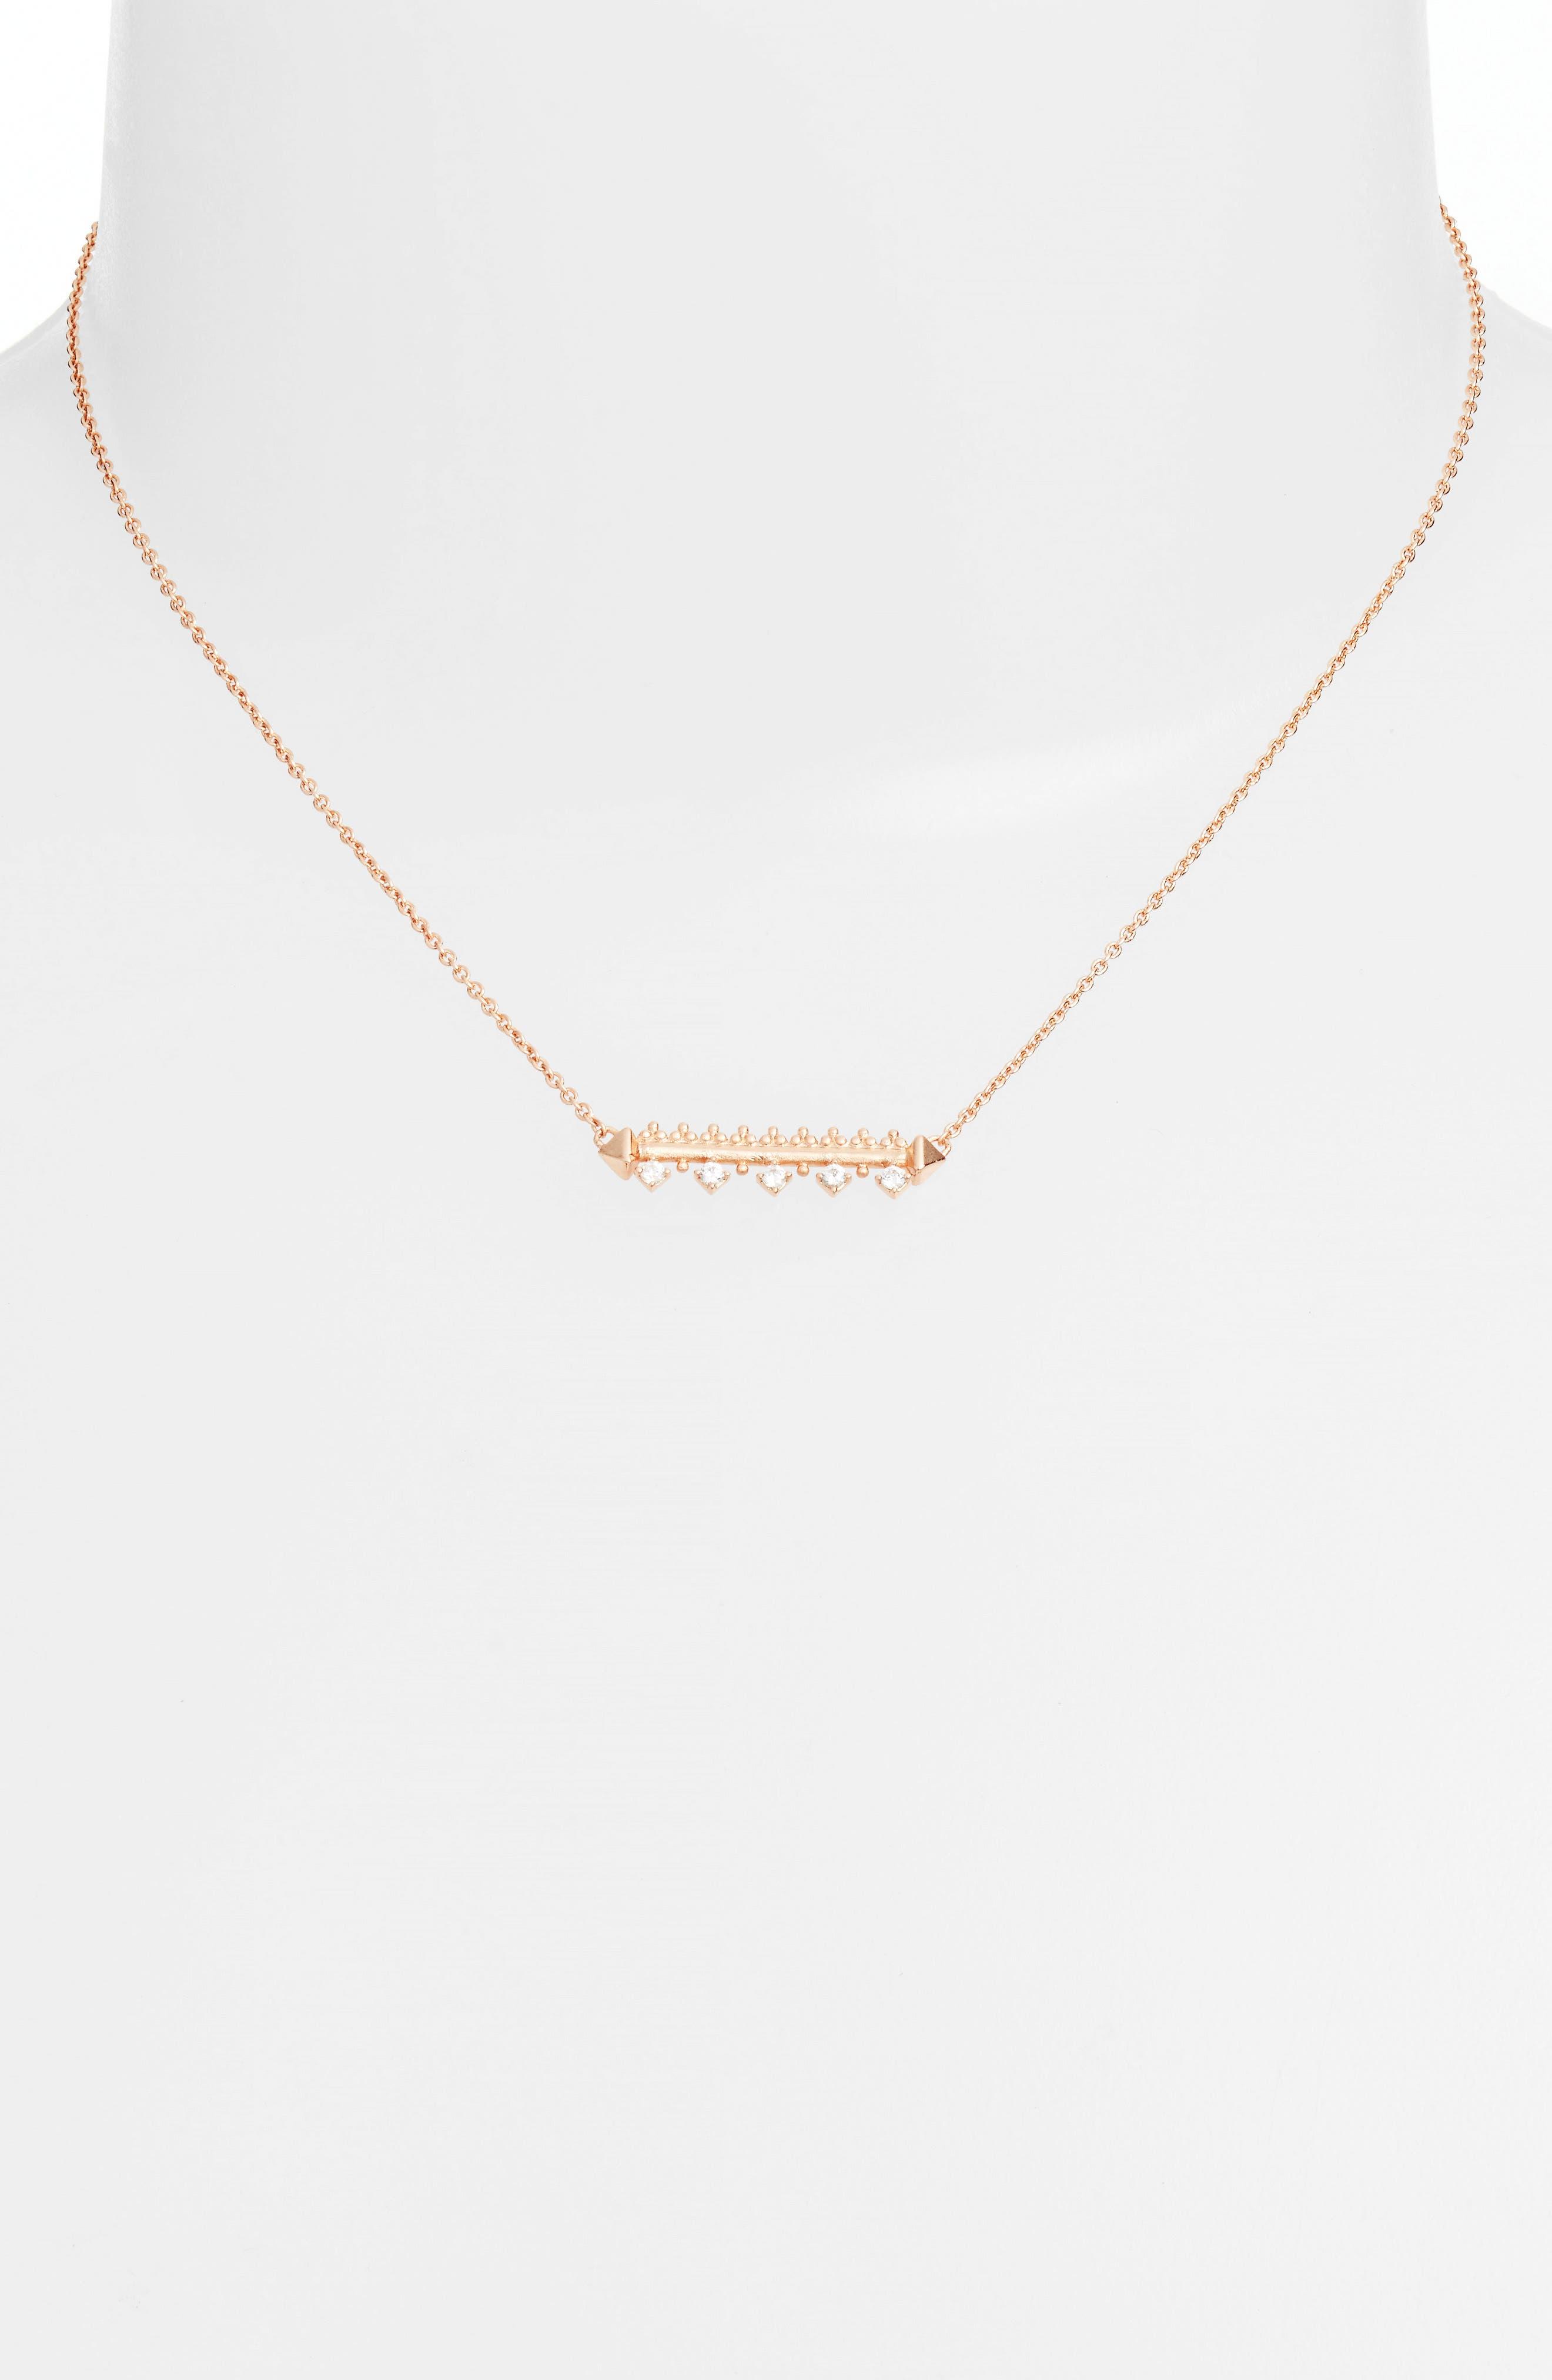 Anissa Bar Pendant Necklace,                             Main thumbnail 1, color,                             Rose Gold